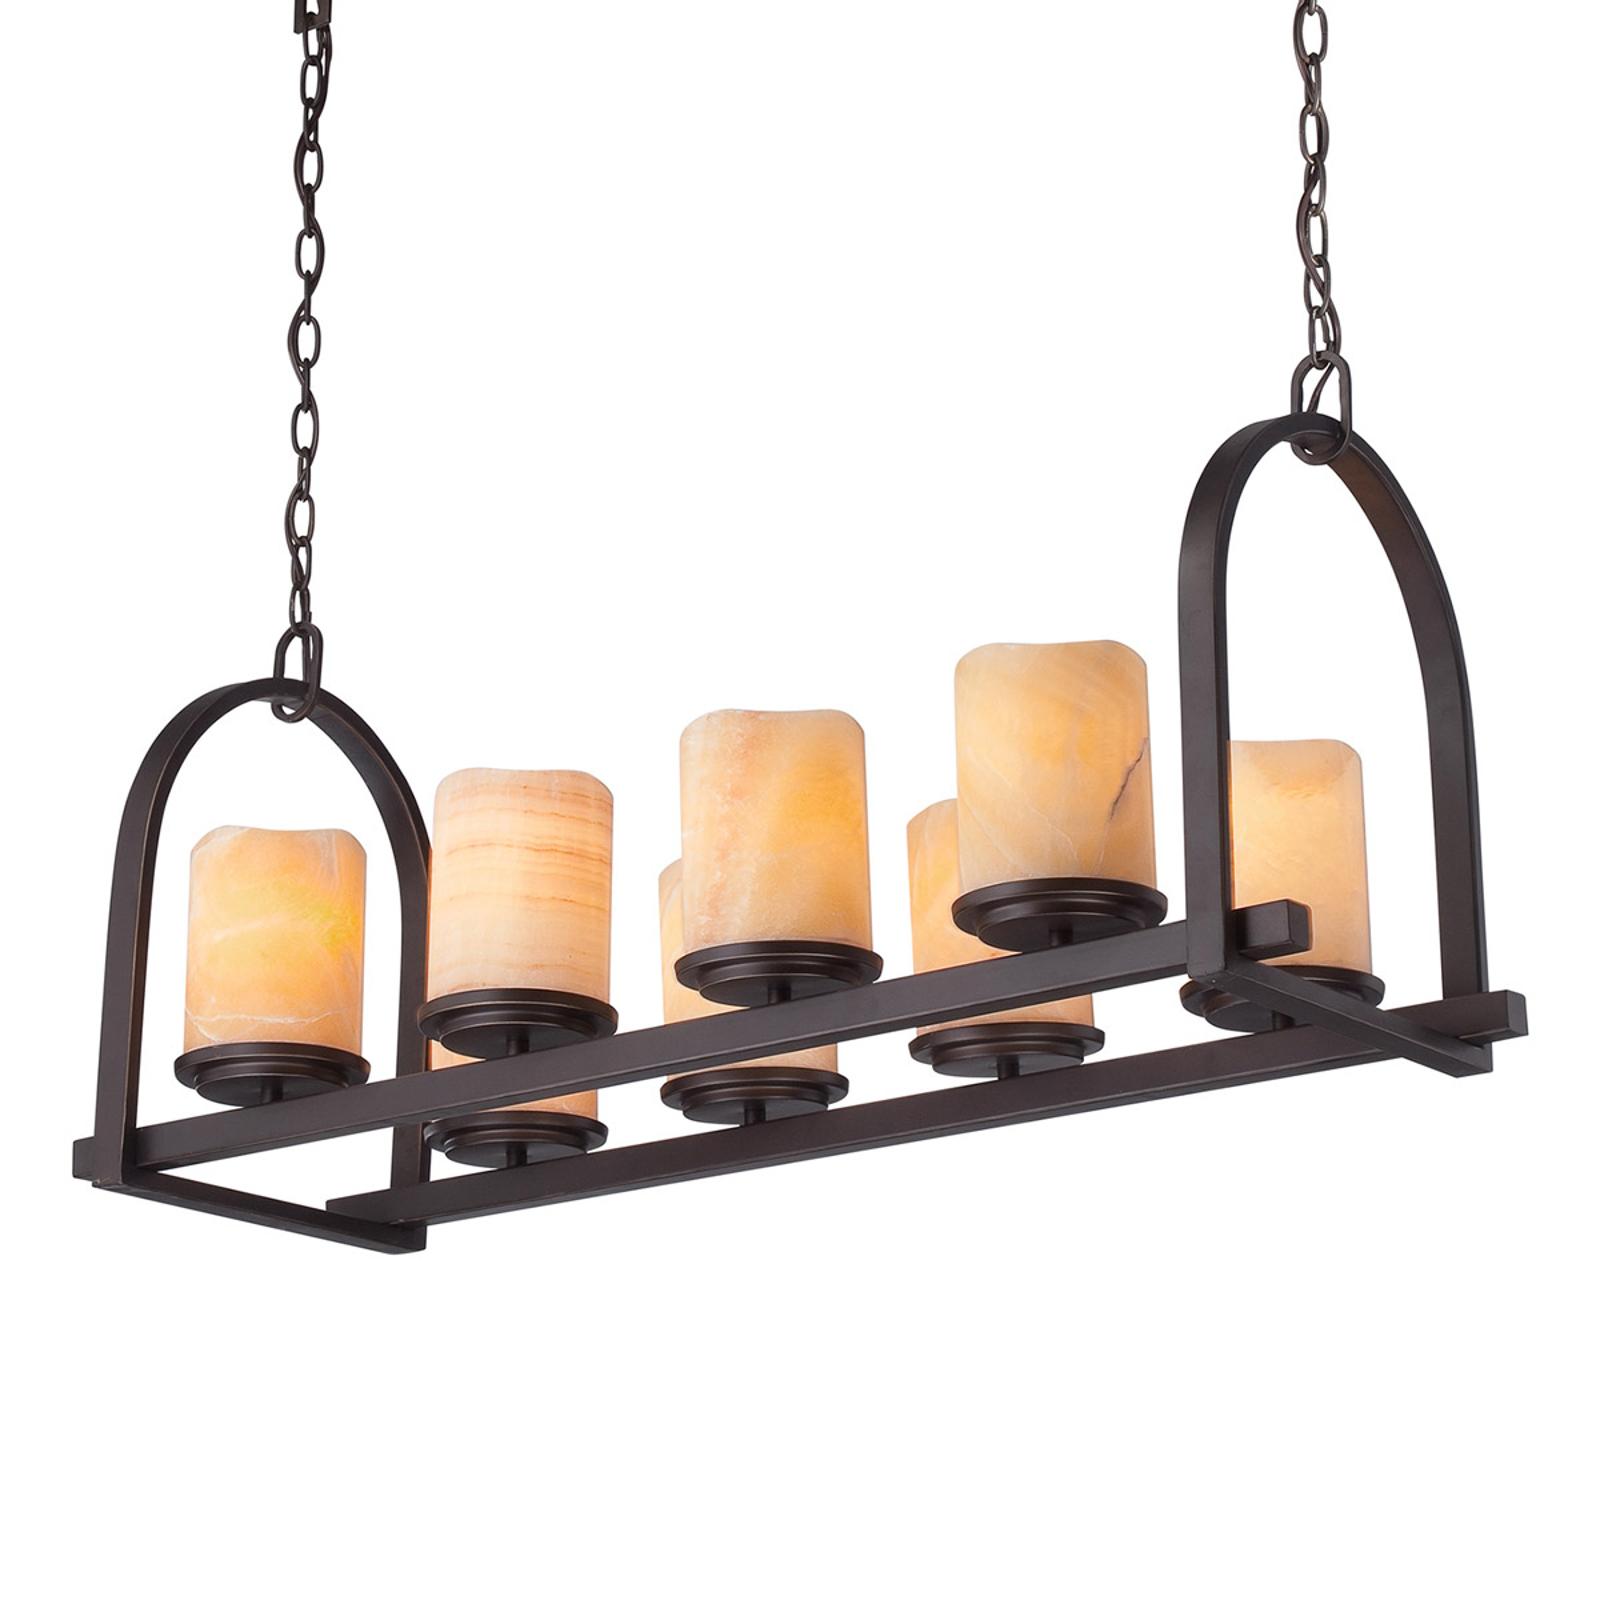 Large suspension Aldora à 8 lampes